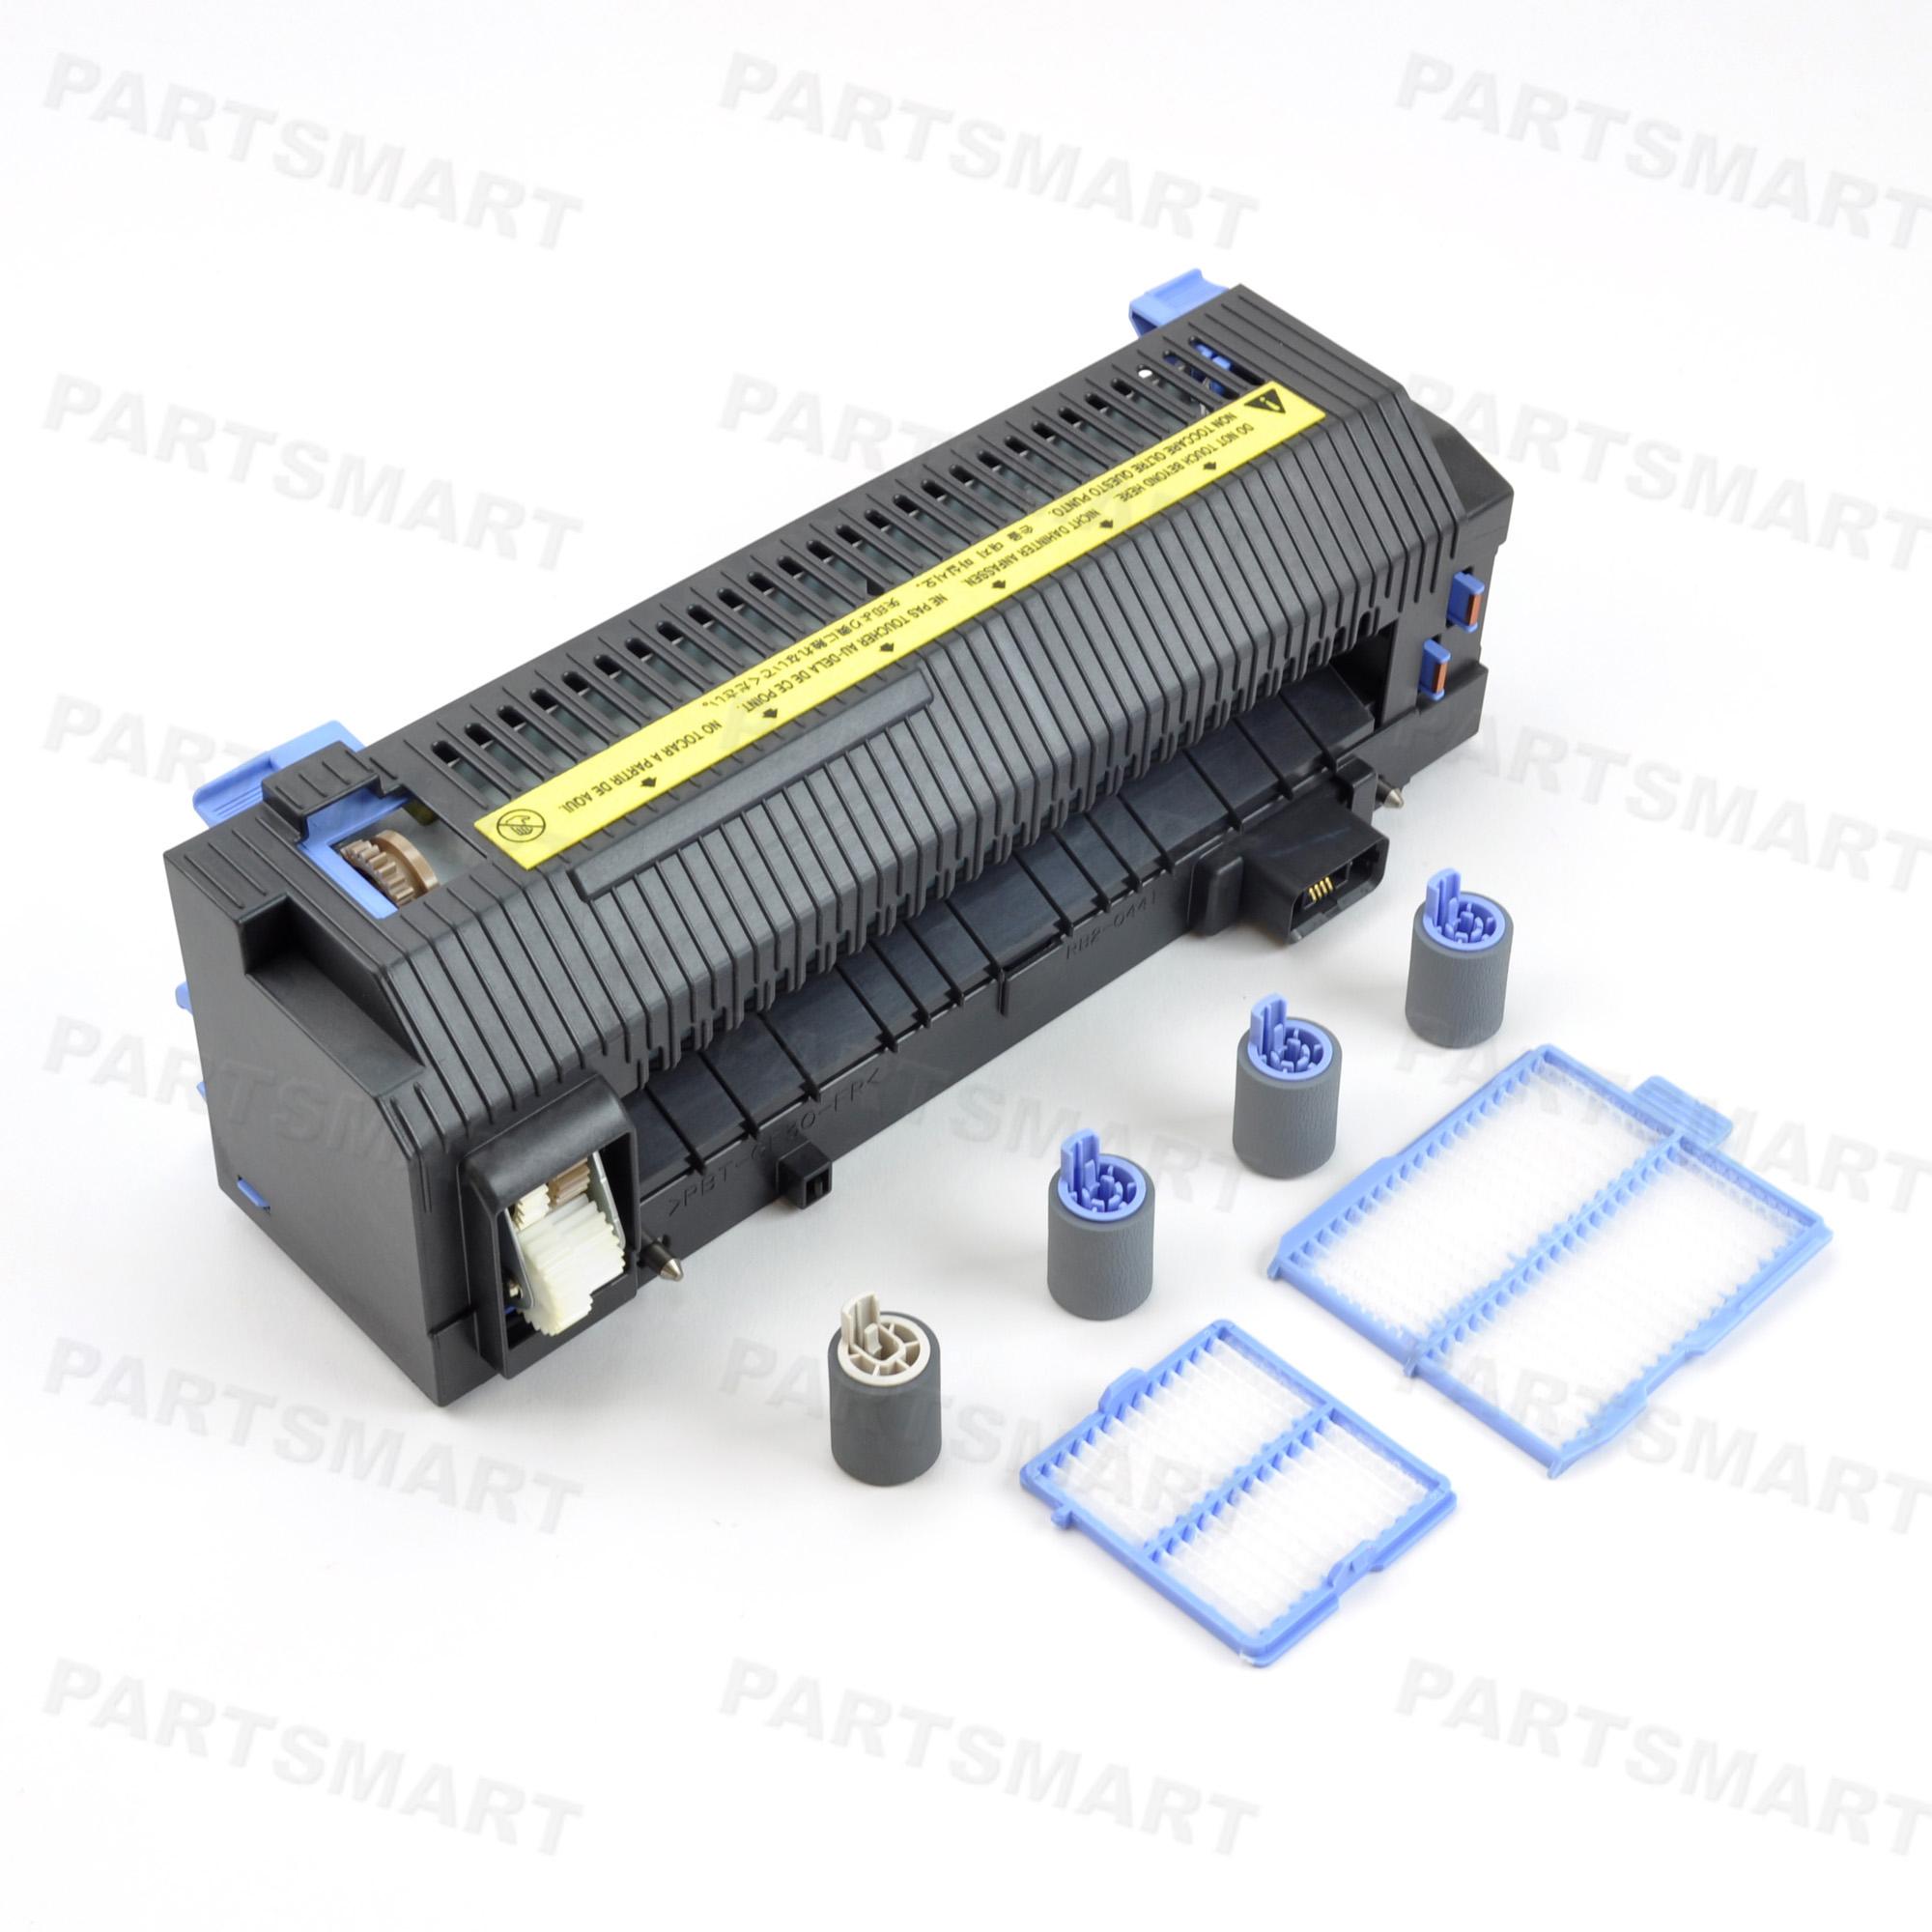 Partsmart Maintenance Kit for HP Laserjet printers: HP450...